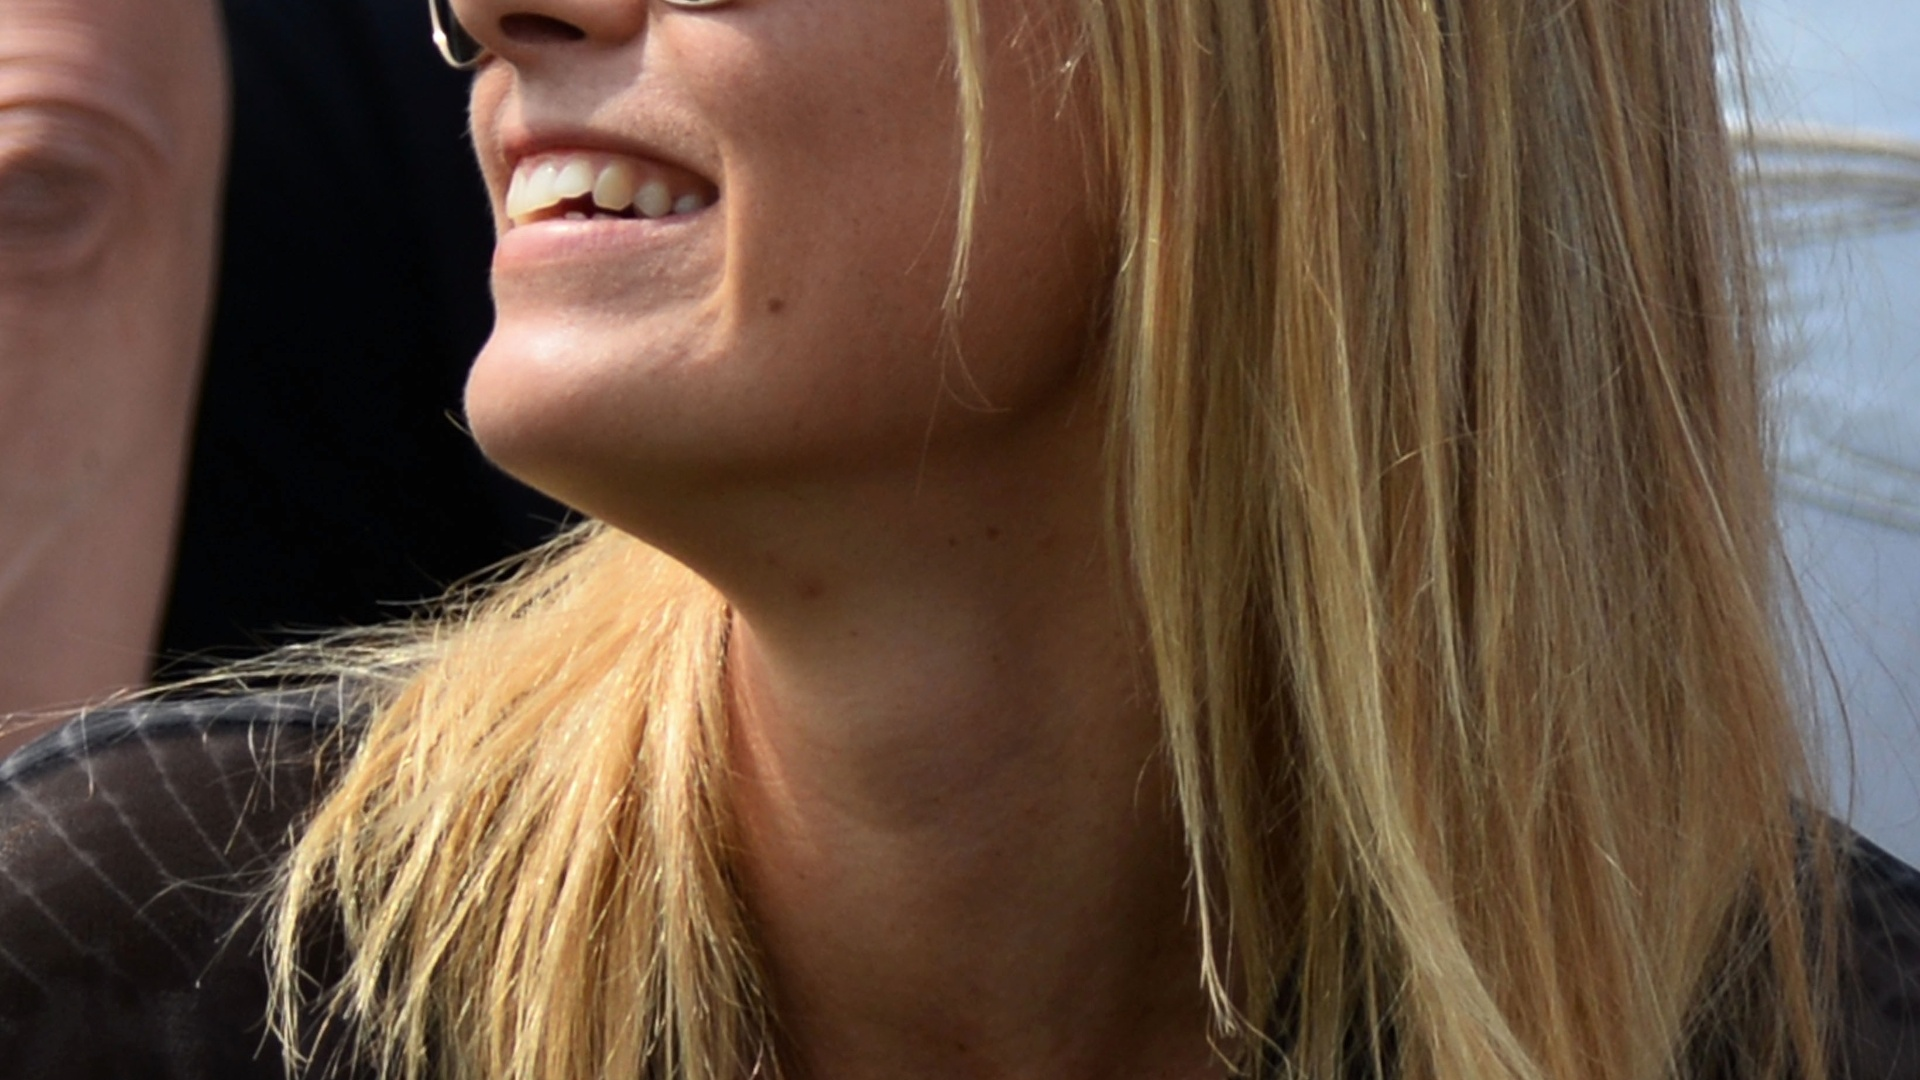 27.jun.2013 - Maria Sharapova sorri enquanto assiste a partida de seu namorado, Grigor Dimitrov, contra Grega Zemlja